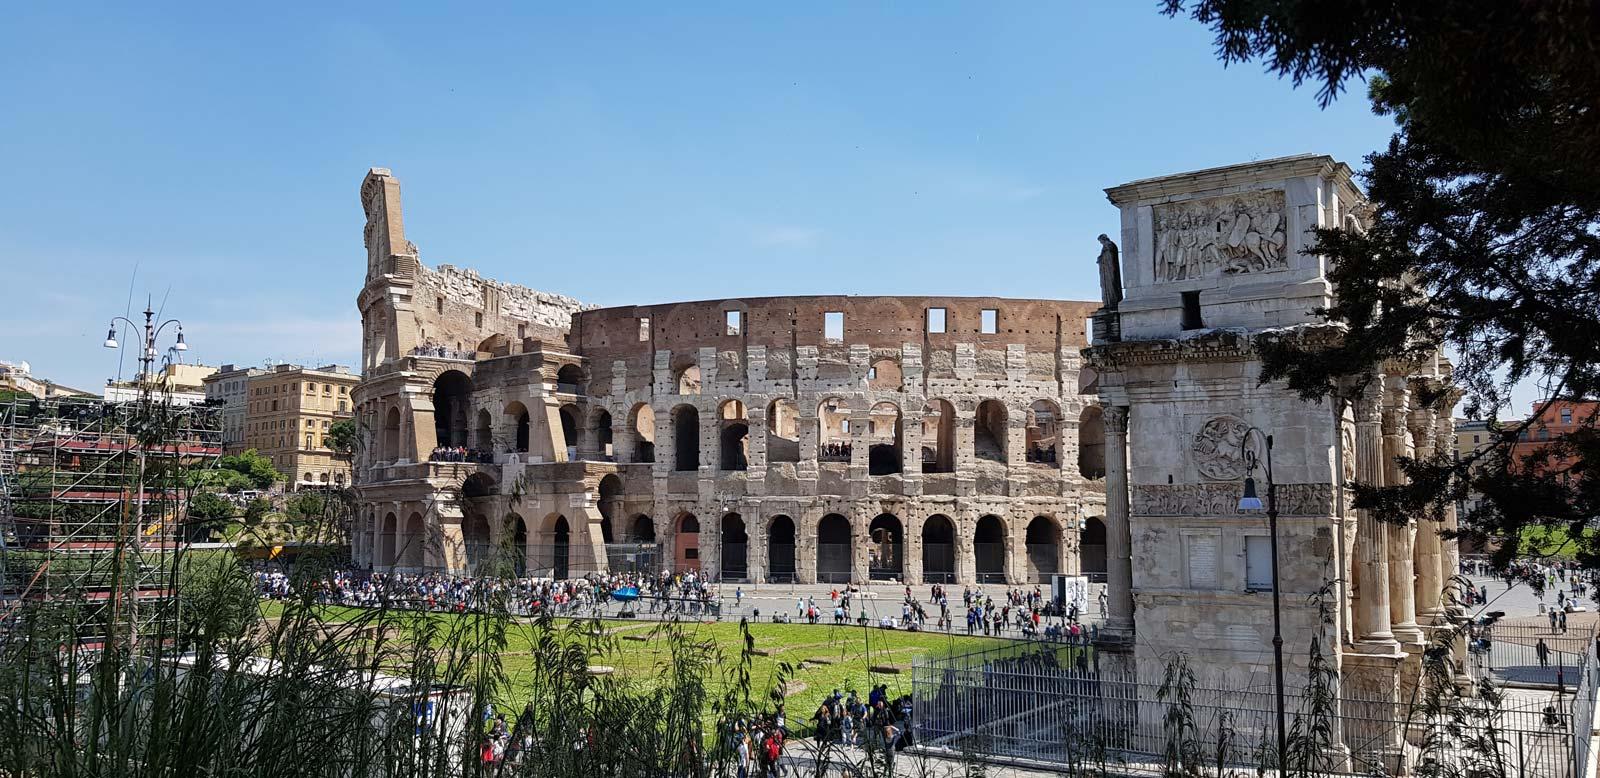 VIP Colosseum, Arena, Underground, Forum and Palatine Hill